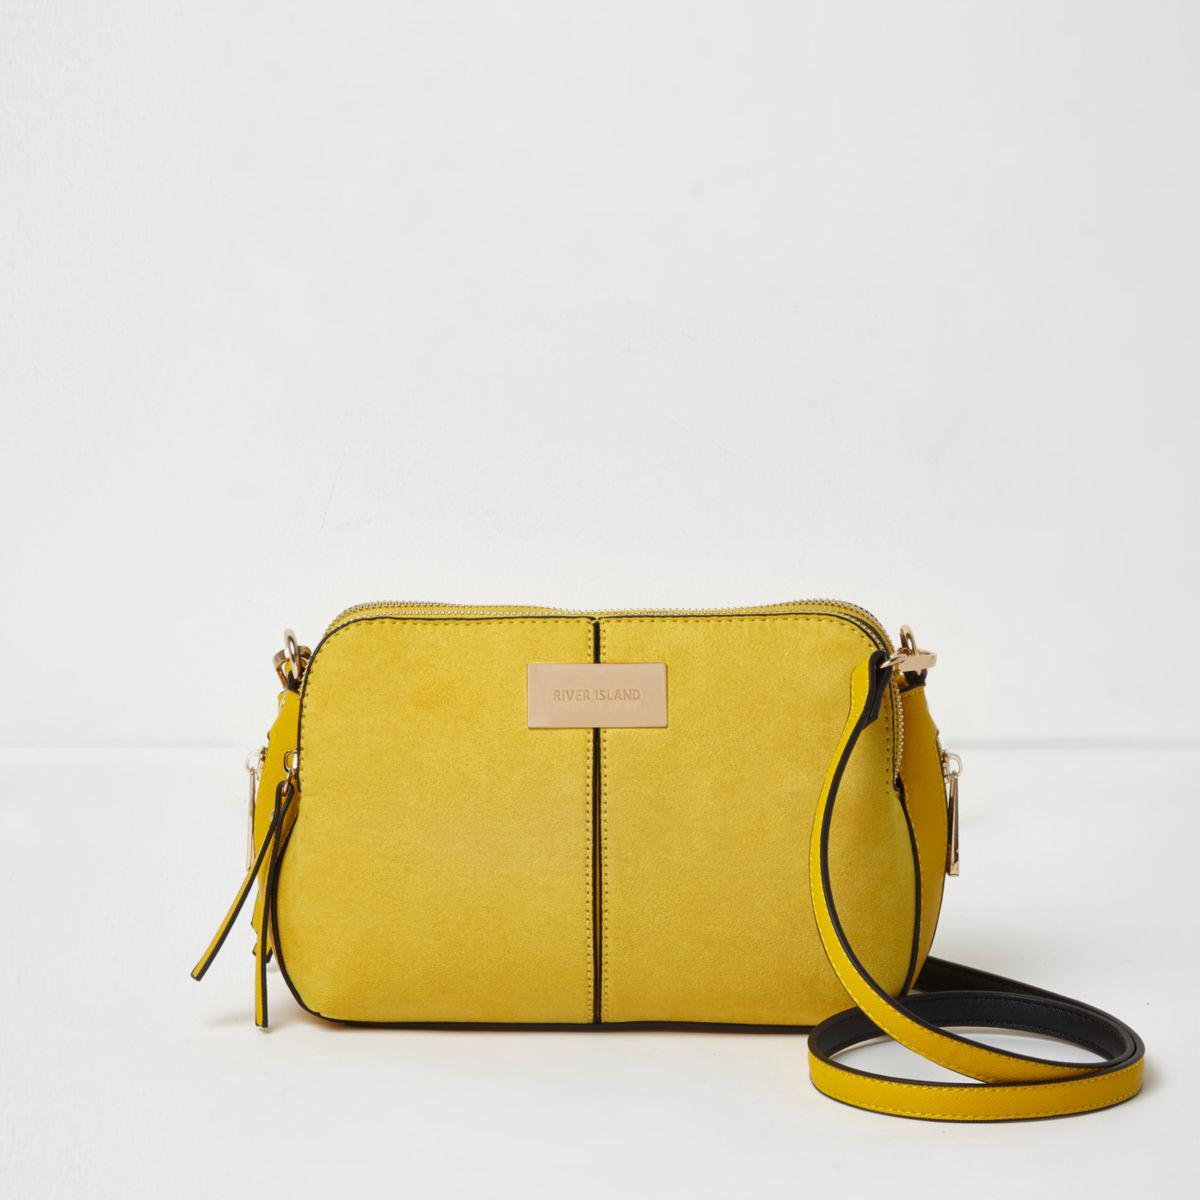 8812bccdc4 River Island Yellow Triple Compartment Cross Body Bag Yellow Triple ...